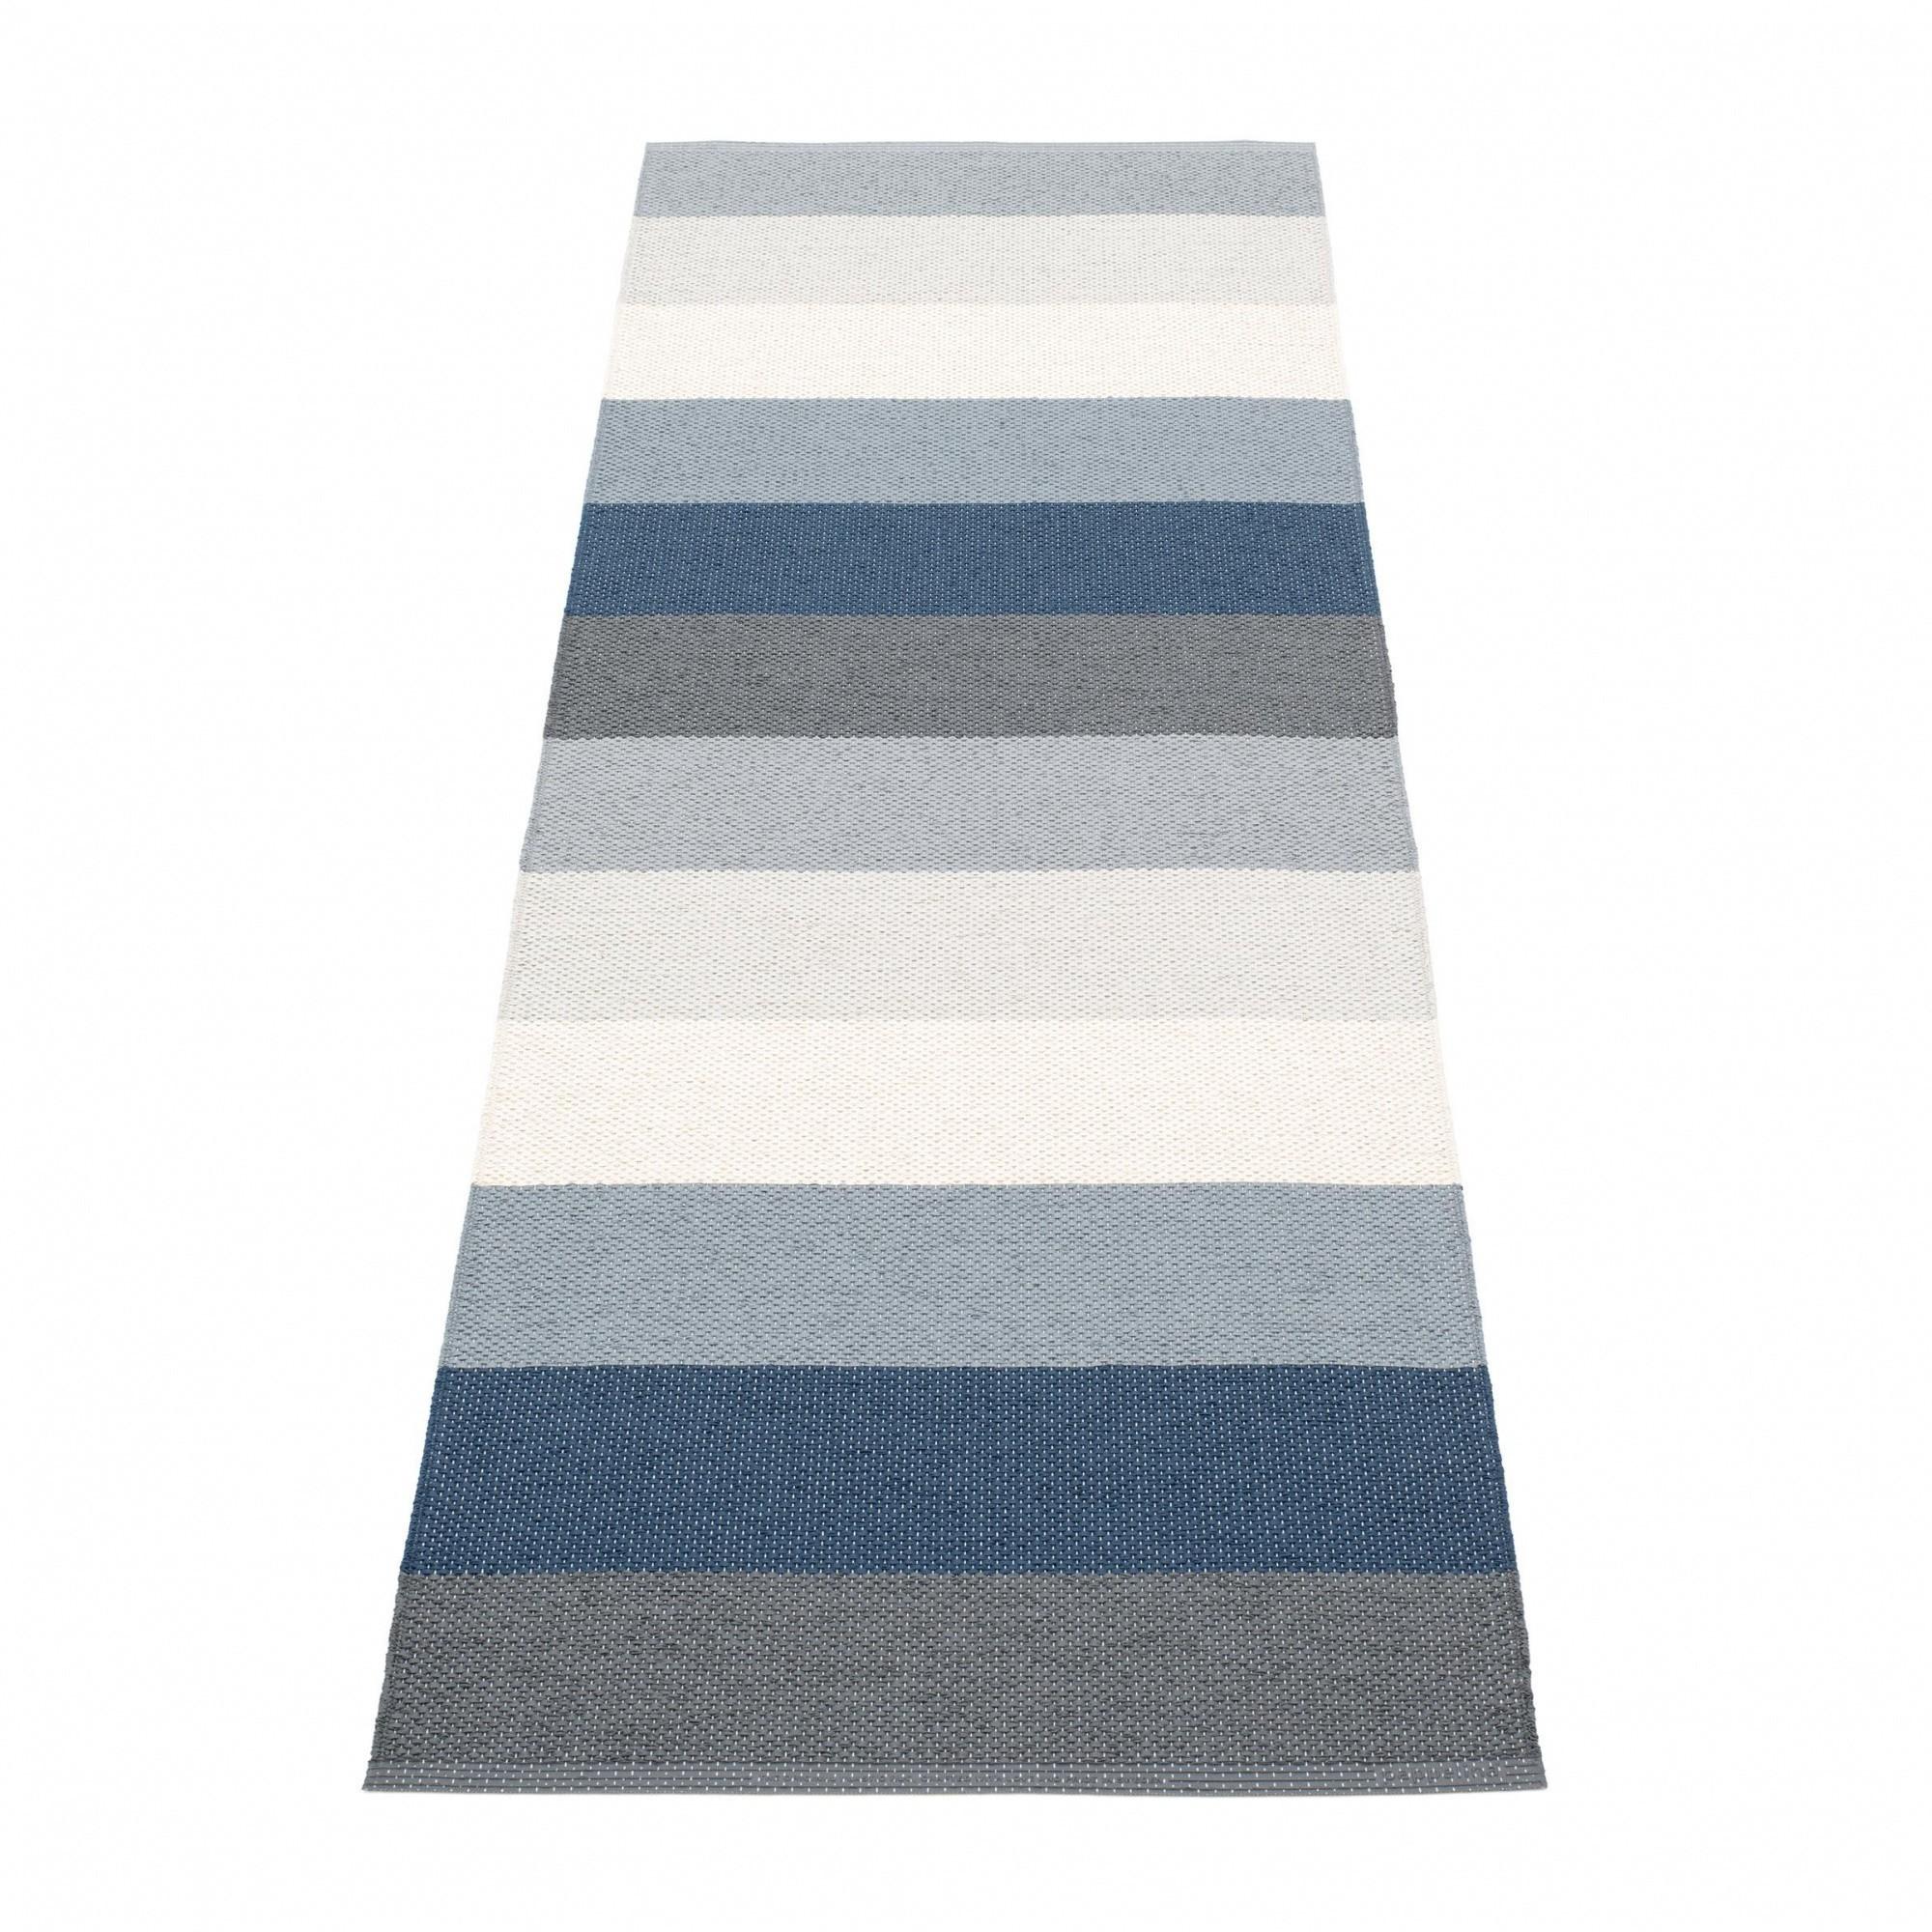 pappelina molly tapis pour l 39 ext rieur 70x200cm ambientedirect. Black Bedroom Furniture Sets. Home Design Ideas